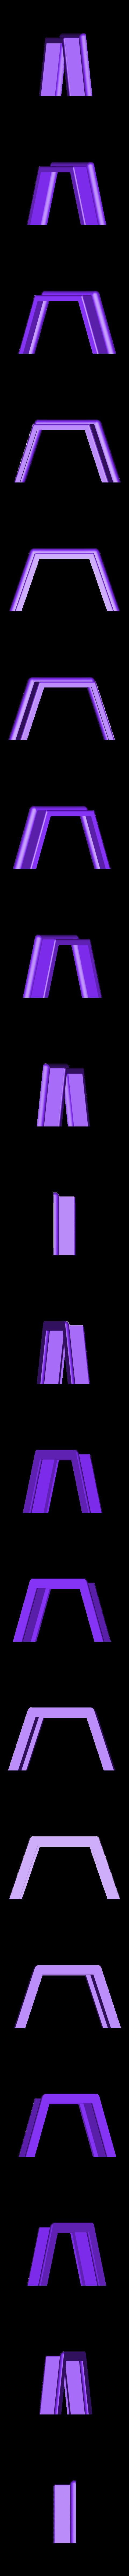 pickup8.stl Download free STL file RC pickup conversion 1/10 scale • 3D printer object, mariospeed